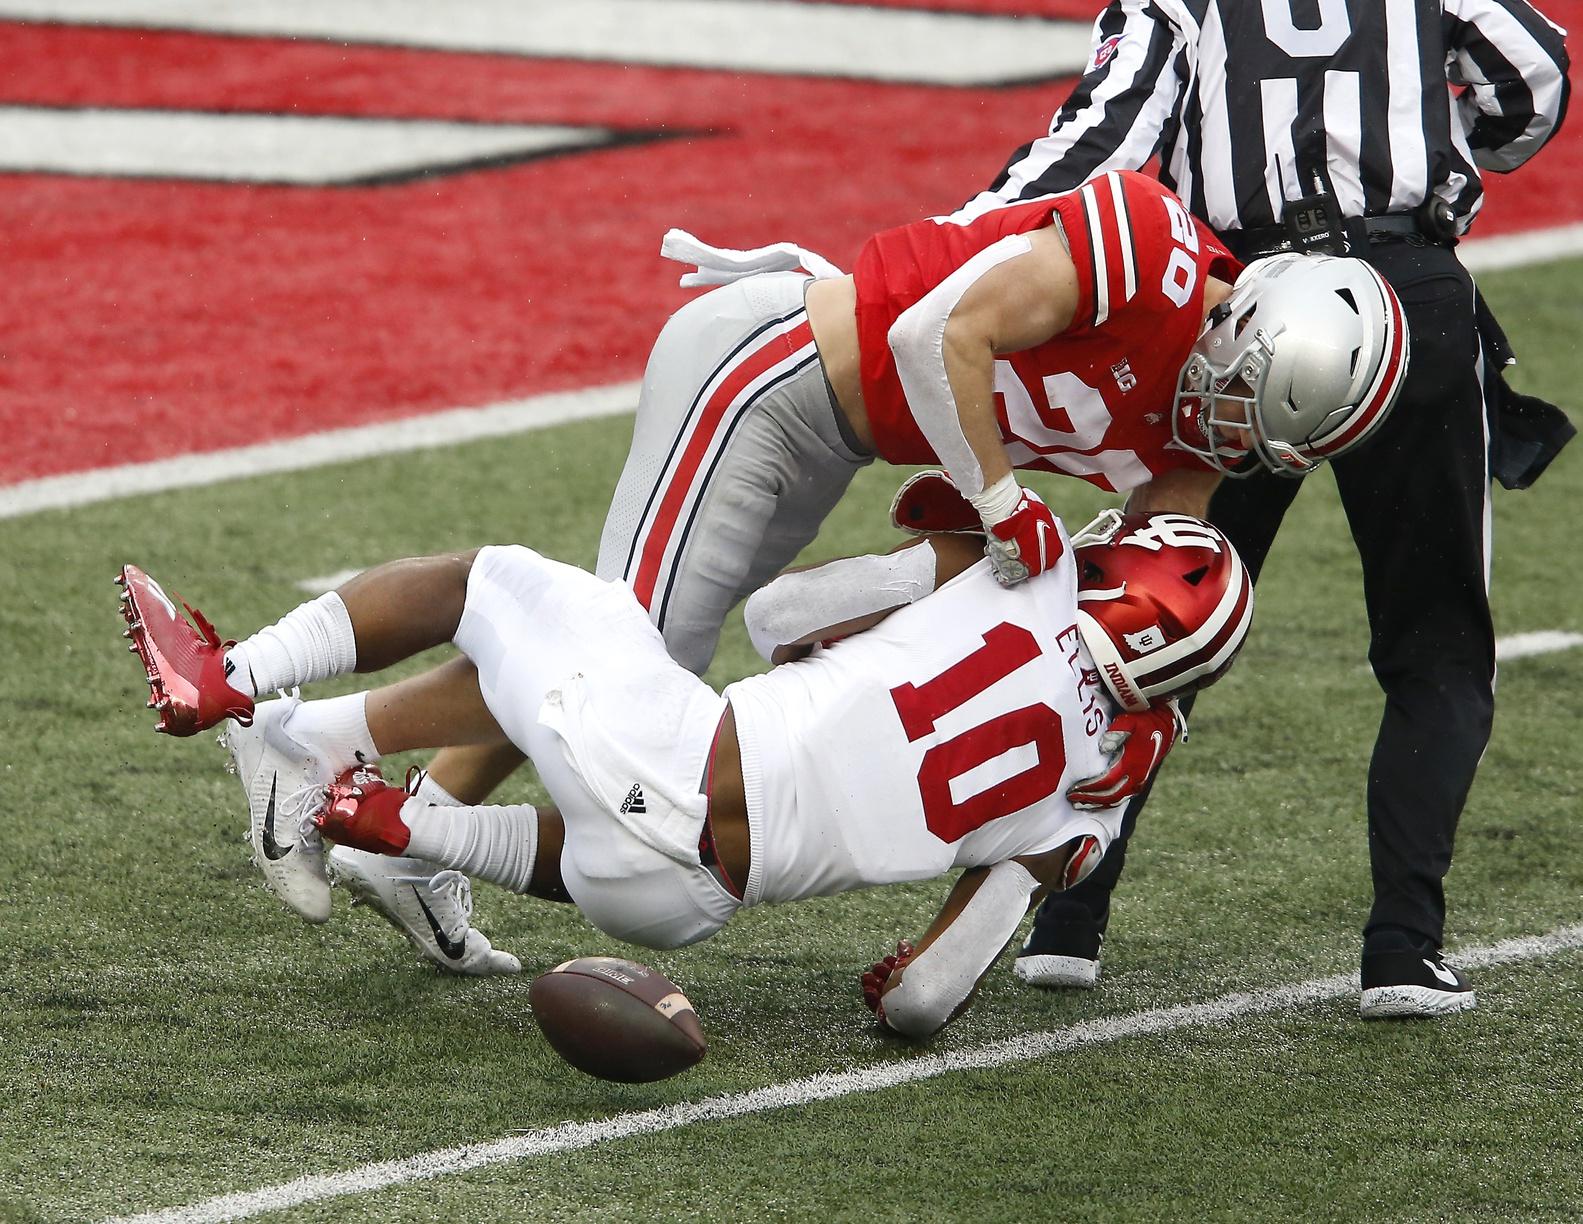 NCAA Football: Indiana at Ohio State - Joseph Maiorana-USA TODAY Sports - Pete Werner